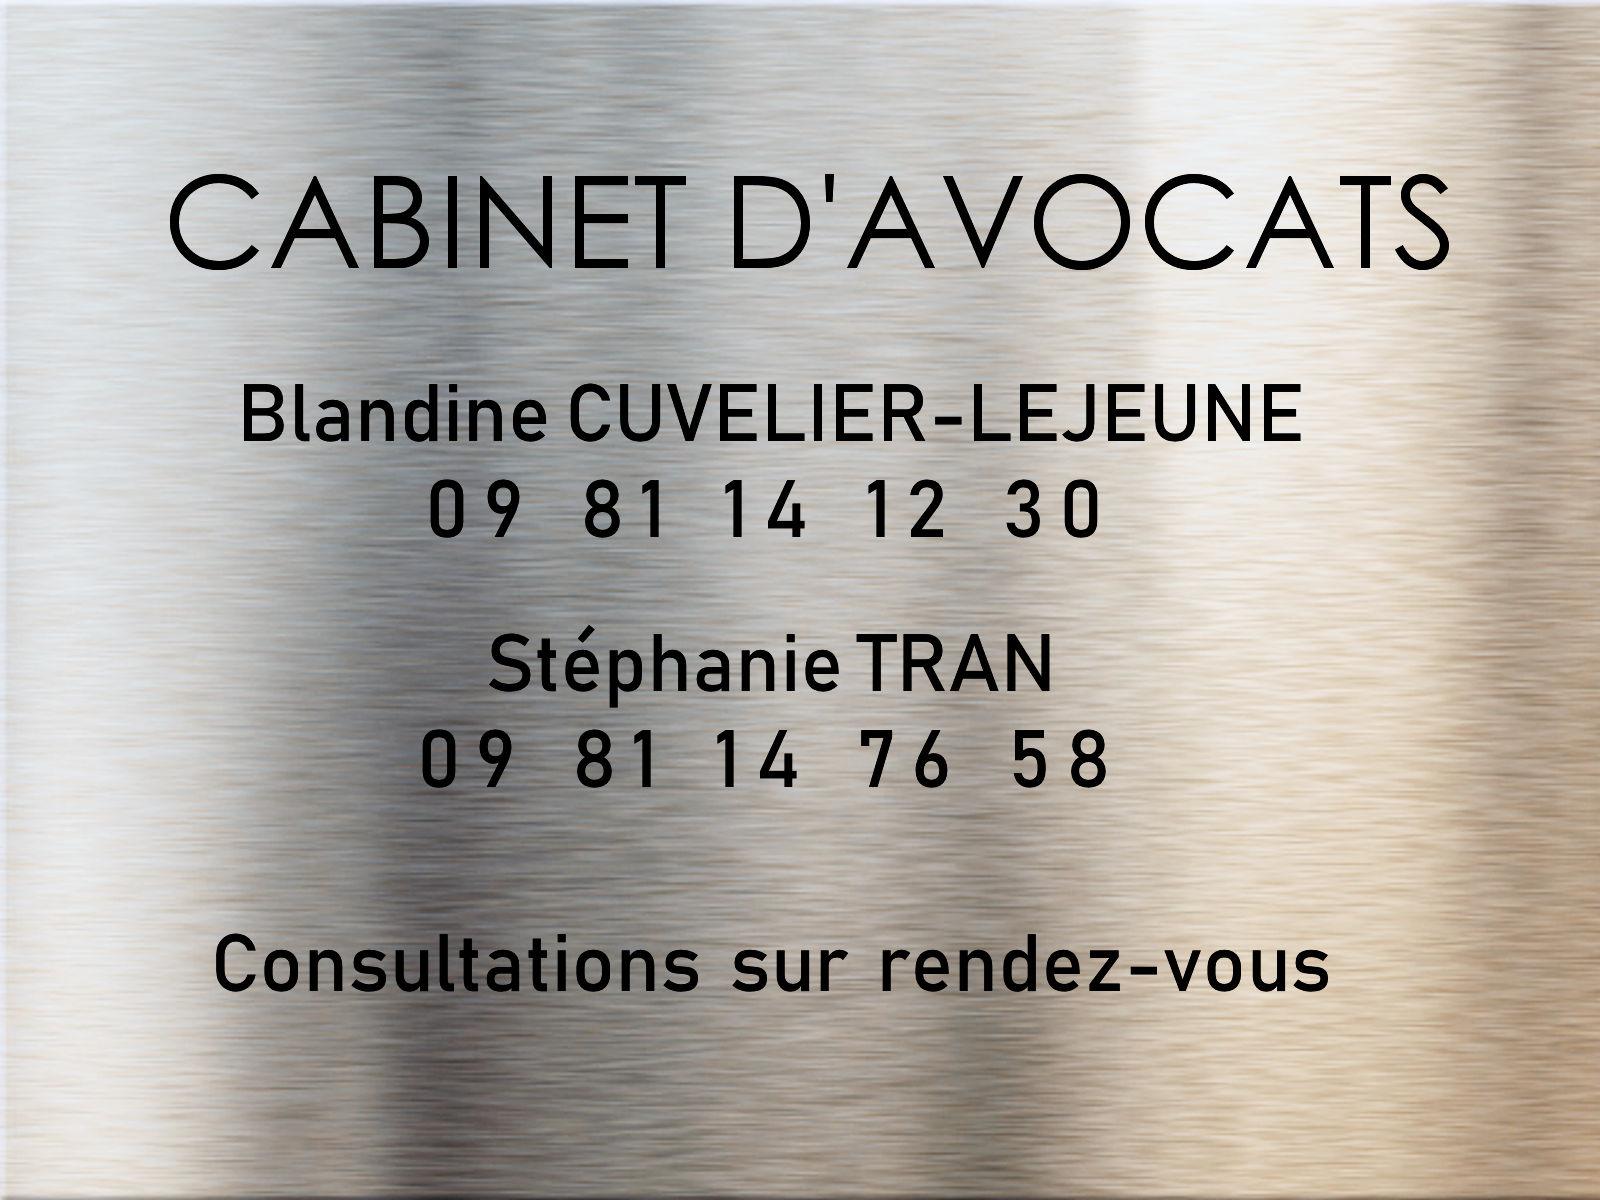 Avocates Cuvelier-Lejeune et Trans - Tourcoing, rue Chanzy